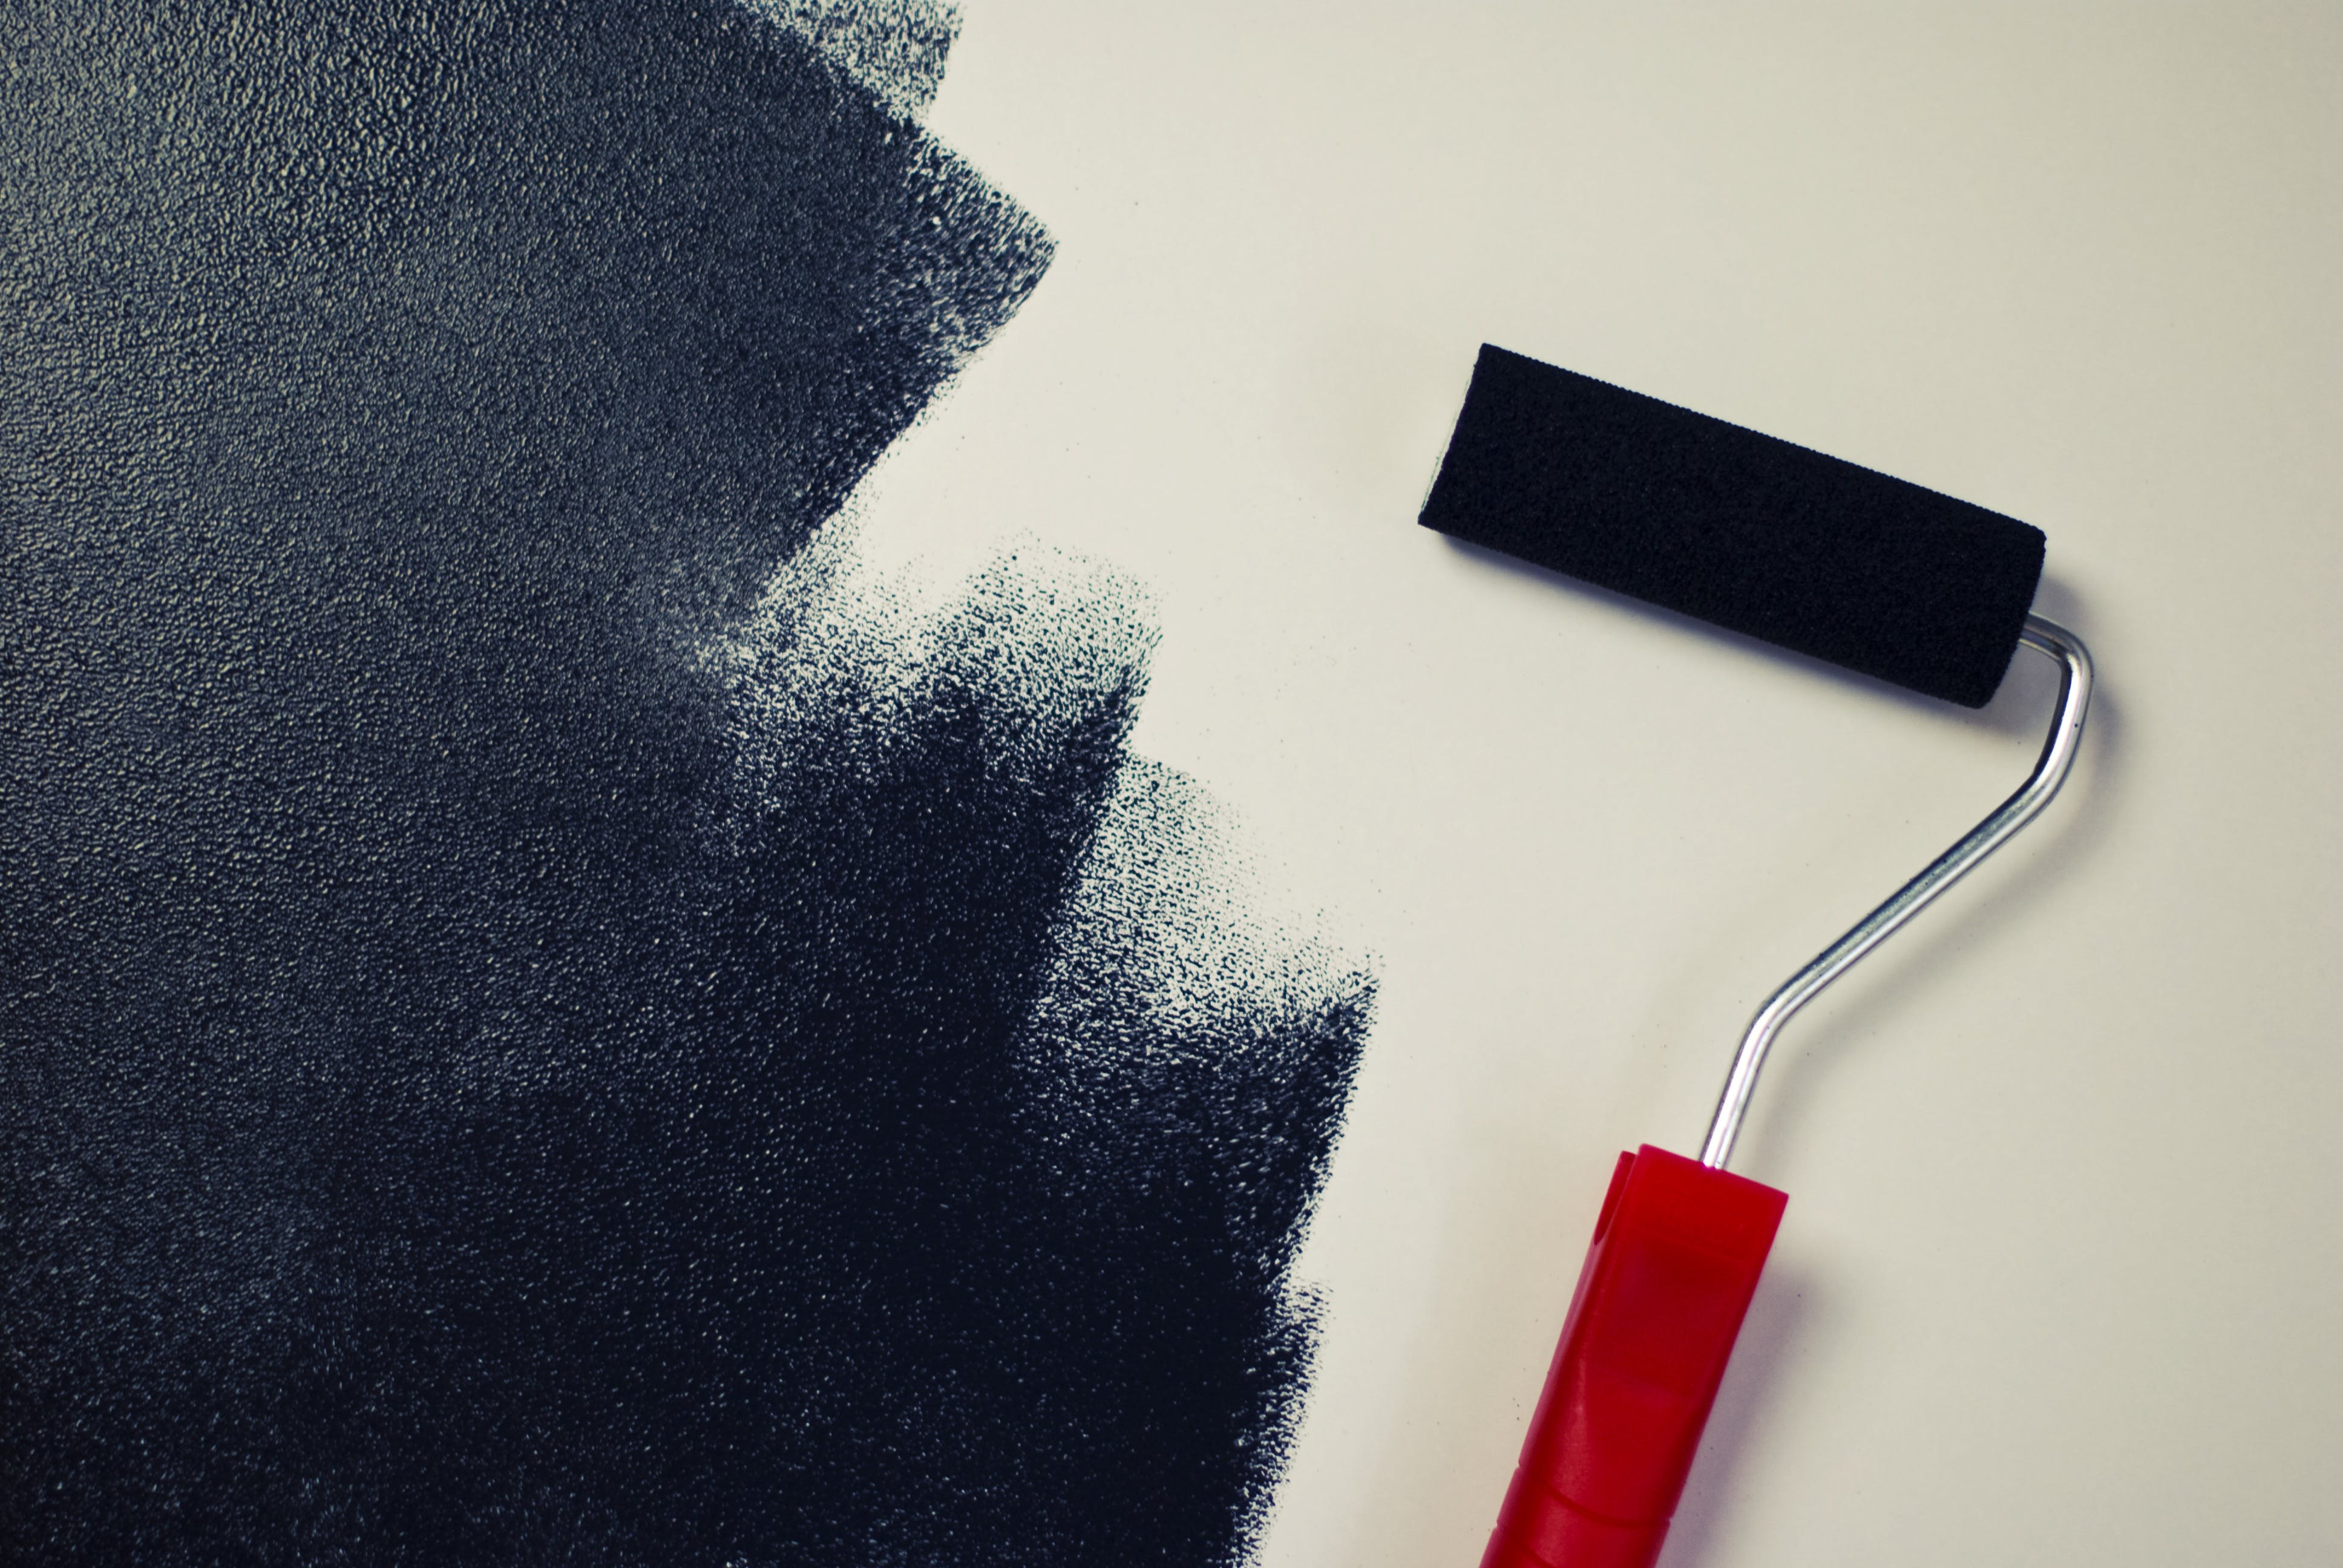 black, paint roller, painting